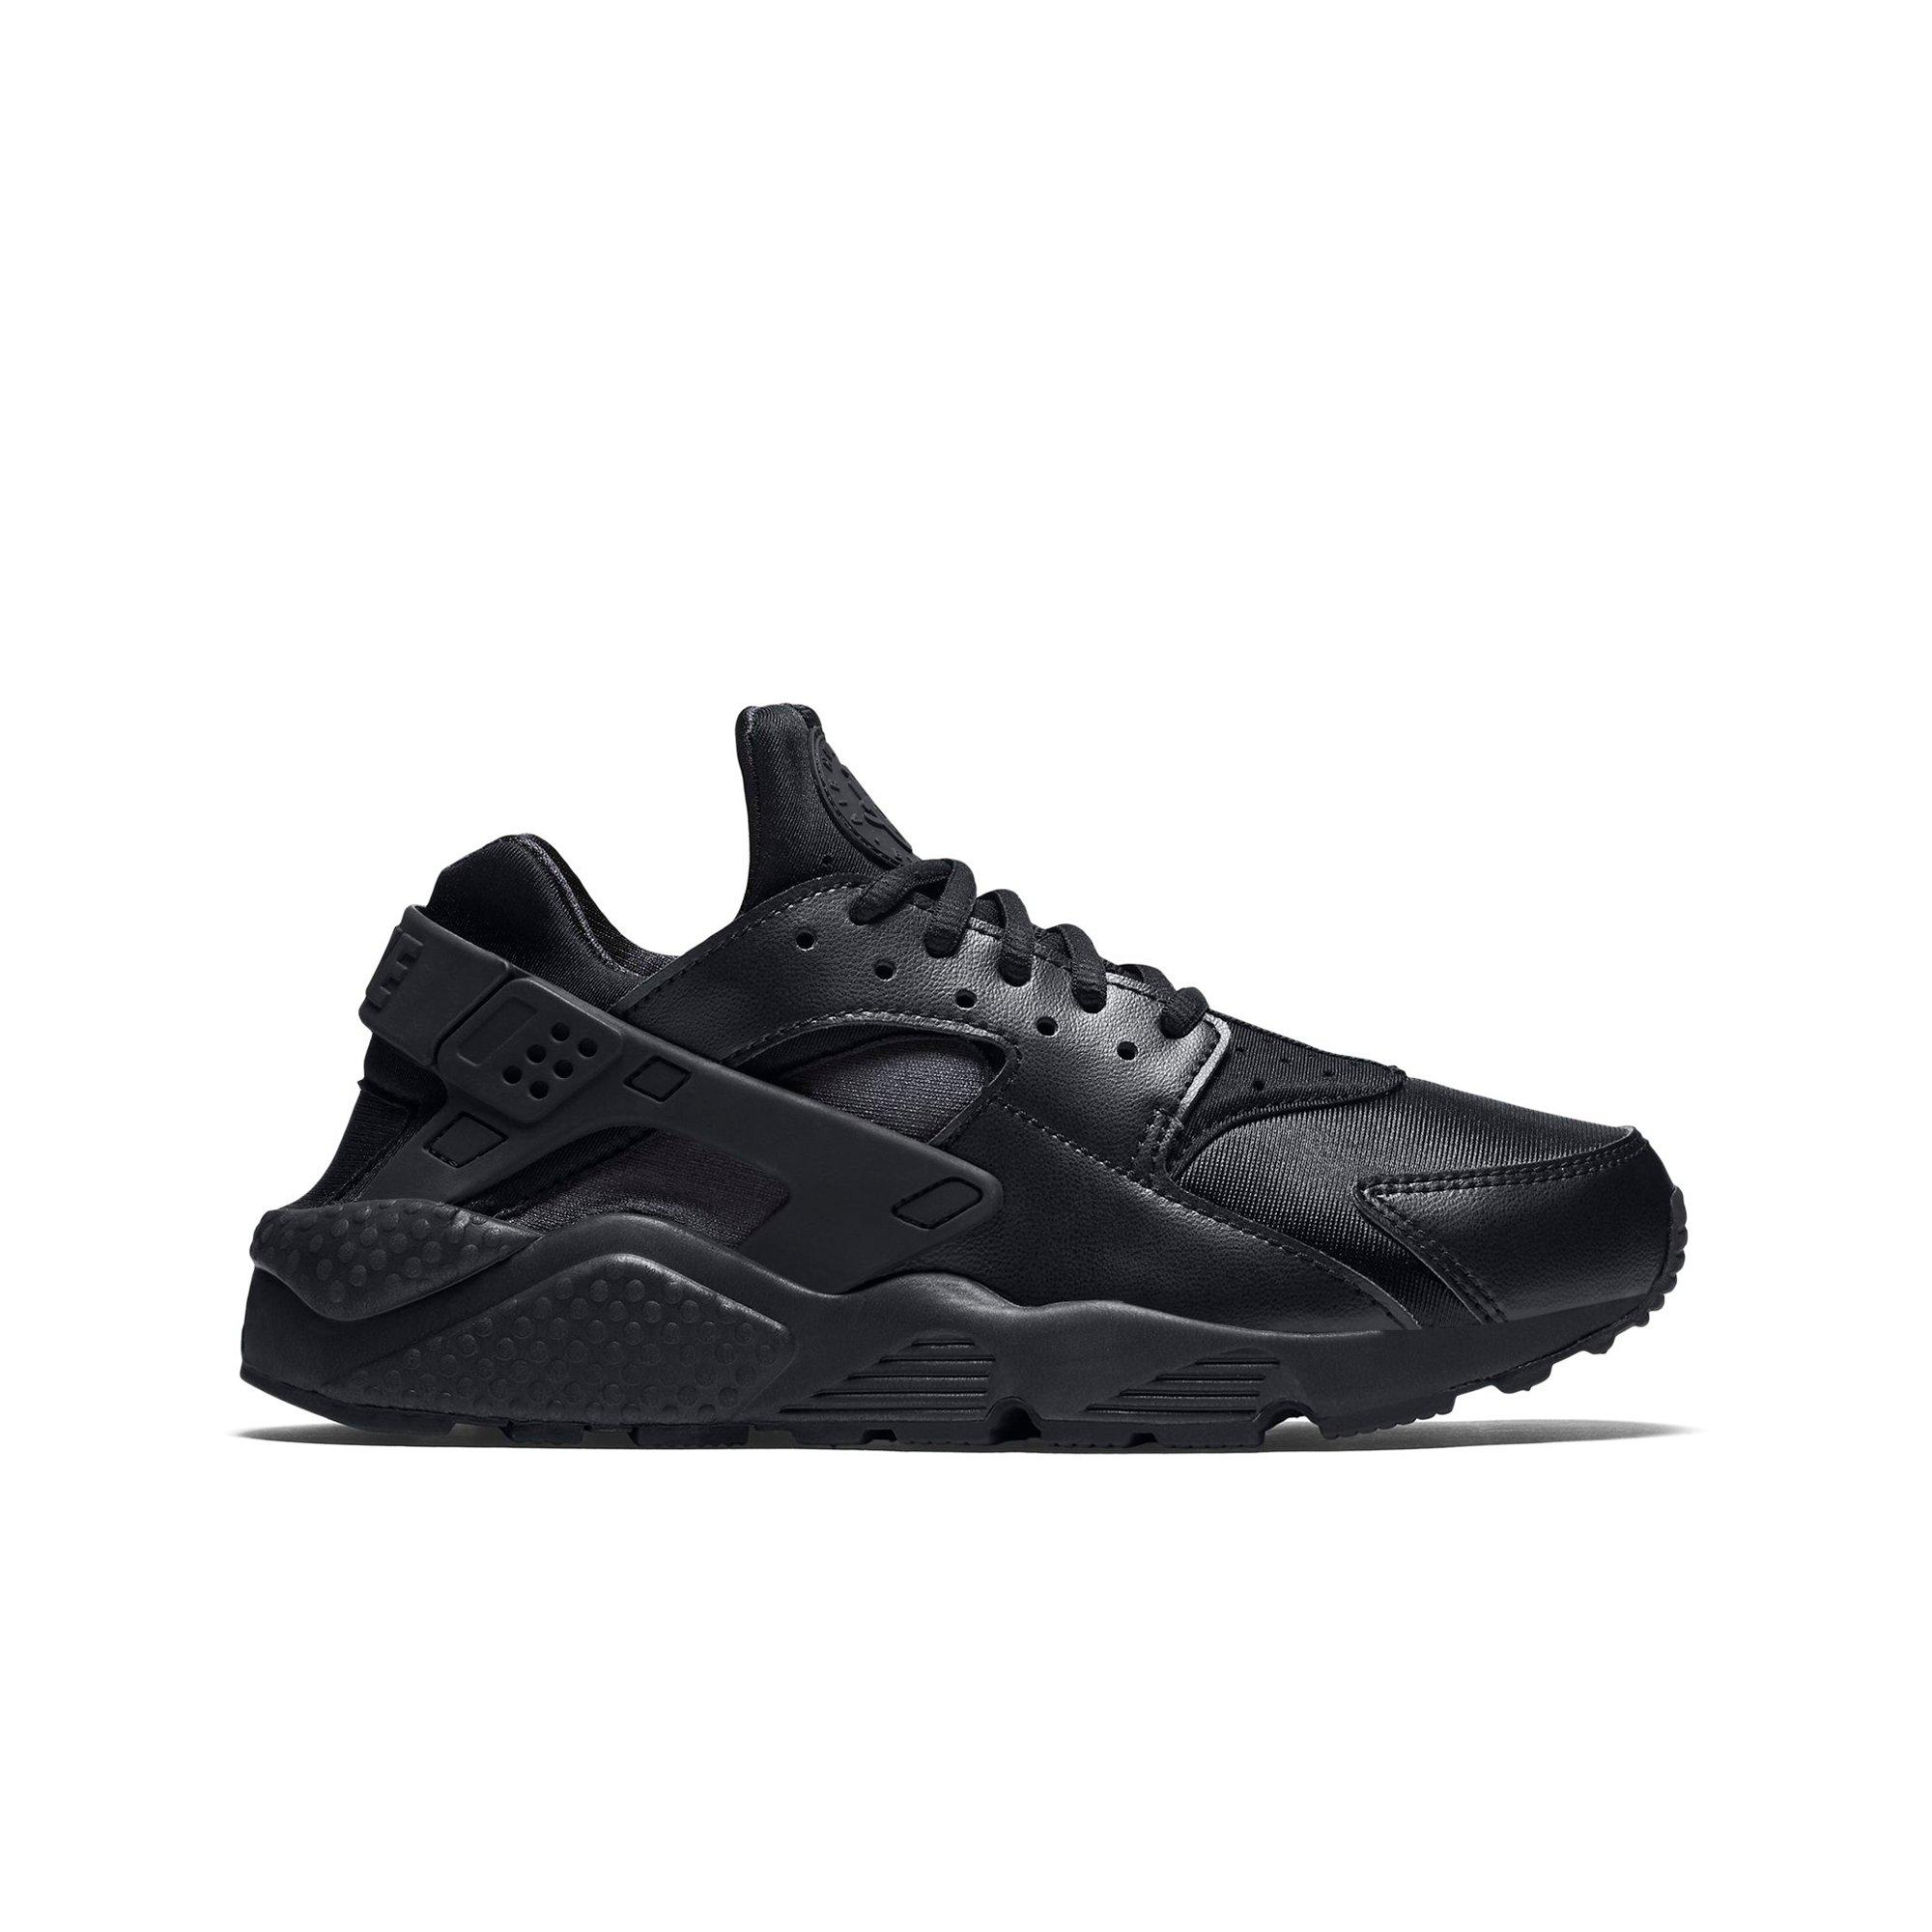 Womens Nike Air Huarache Run Ultra Casual Shoes - Musée des ... 22f8dee47f7d